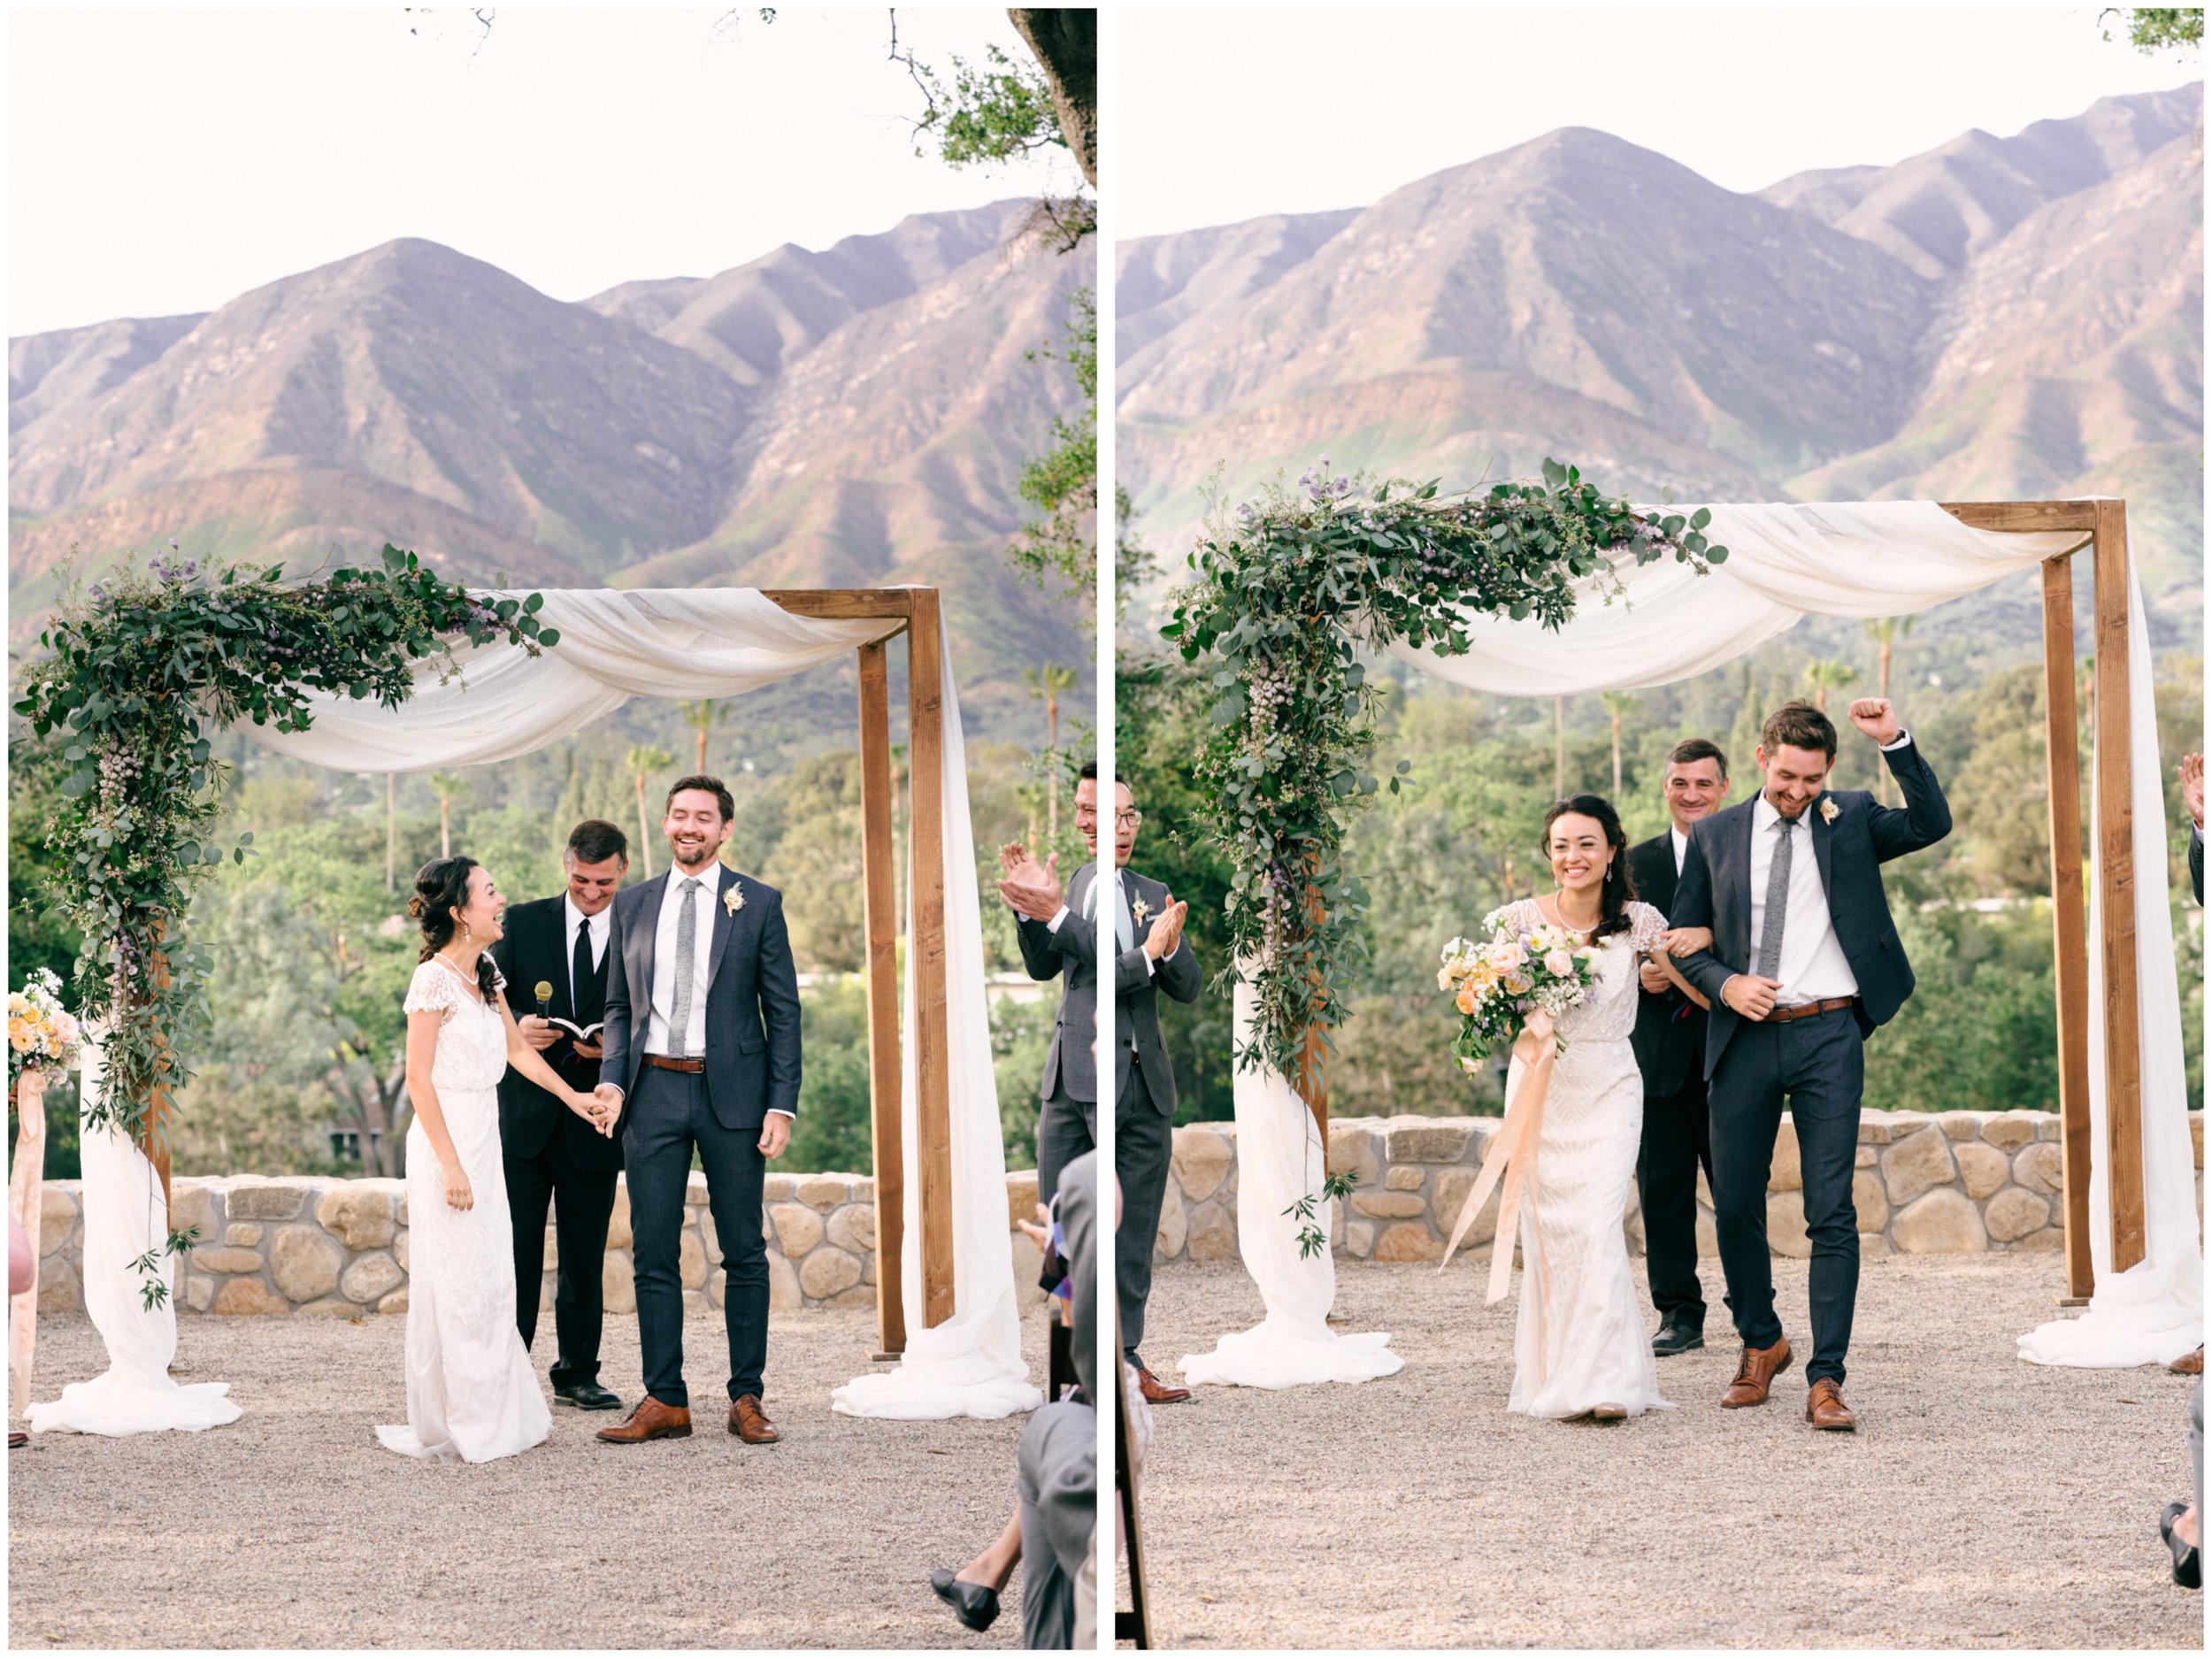 Ojai_Wedding_Photographer_Pinnel_Photography_Ventura_Planner-11.jpg